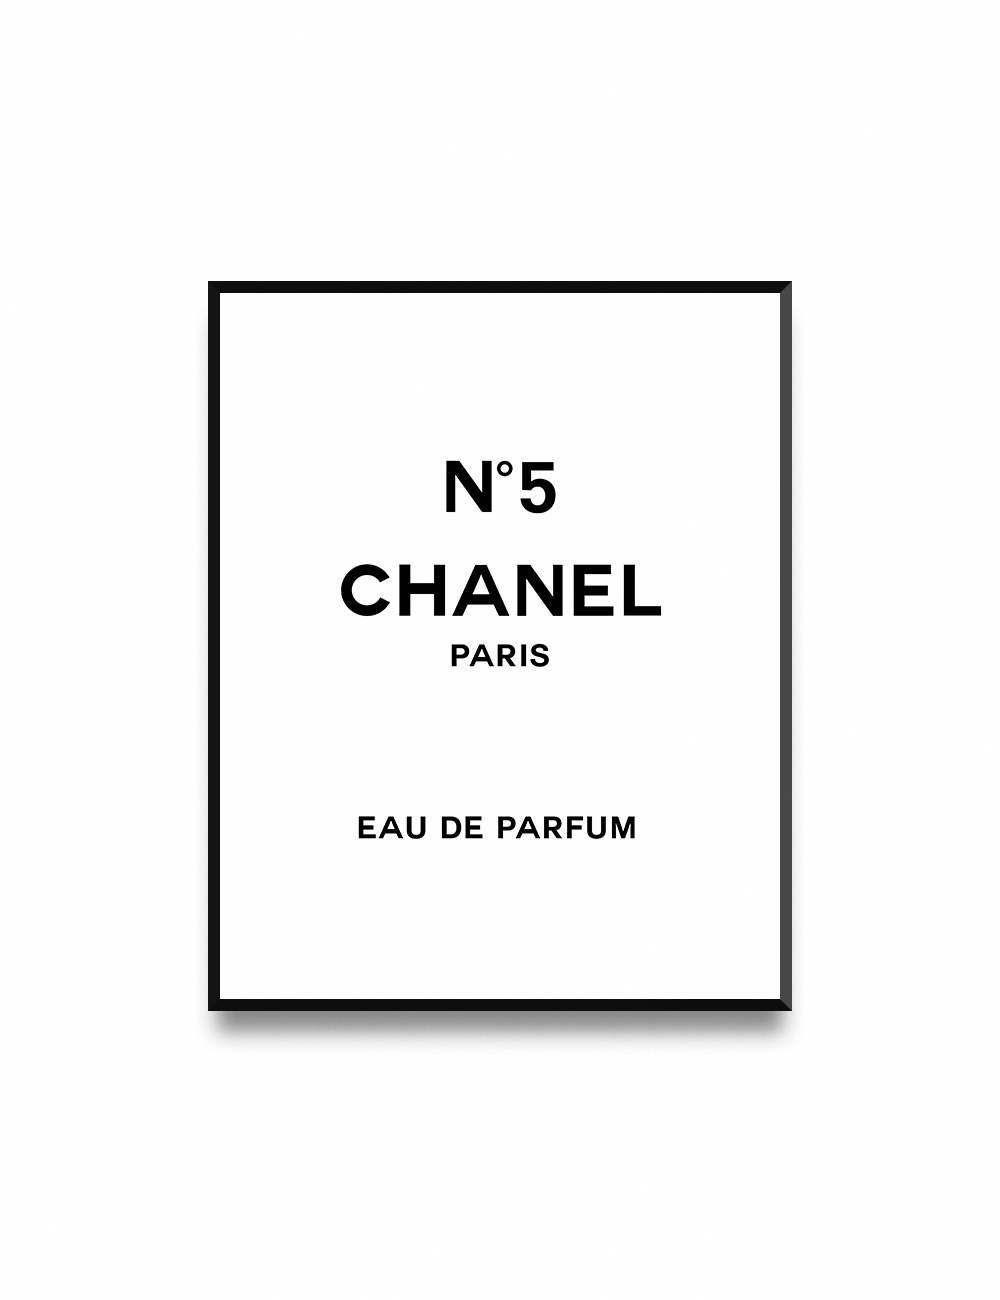 Chanel Print, Fashion Art, Chanel Logo, Chanel Logo Print, Fashion Print, Chanel Printable, Coco Chanel Print, Coco Chanel Logo